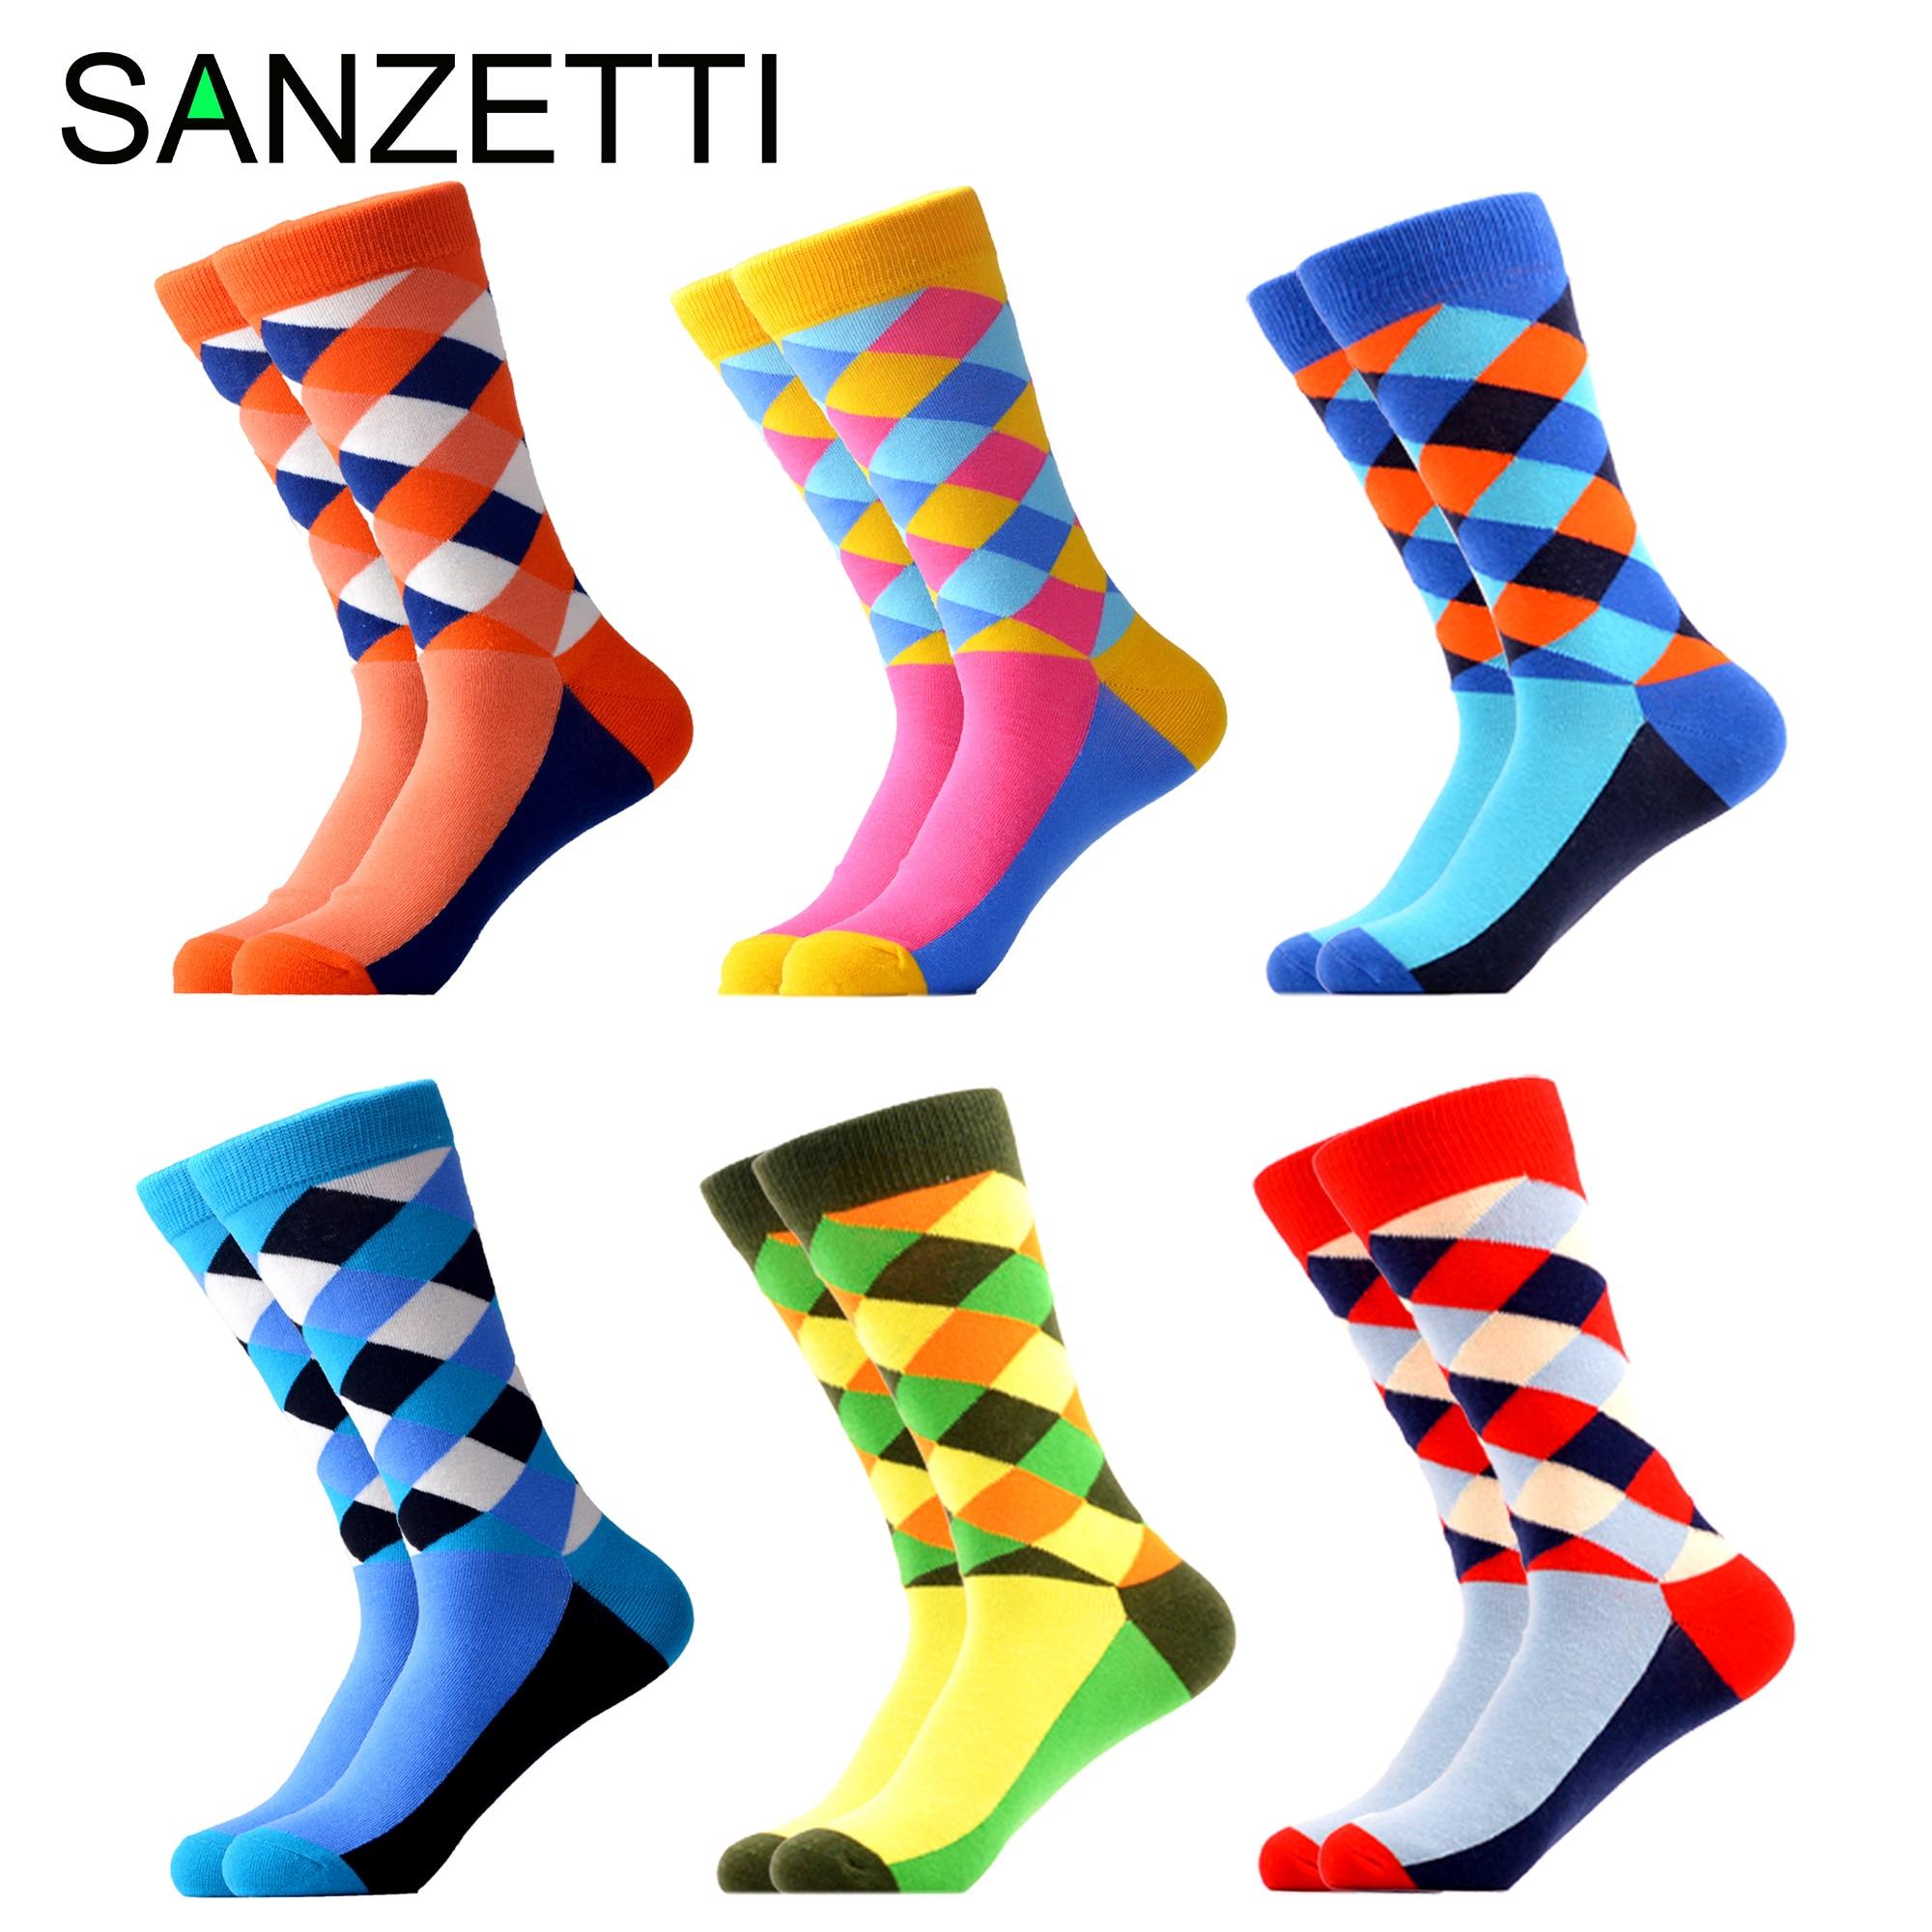 SANZETTI 6 Pairs/Lot Casual Socks Men's Happy Combed Cotton Bright Socks Fruit Pattern Comfortable Fun Party Birthday Gift Socks